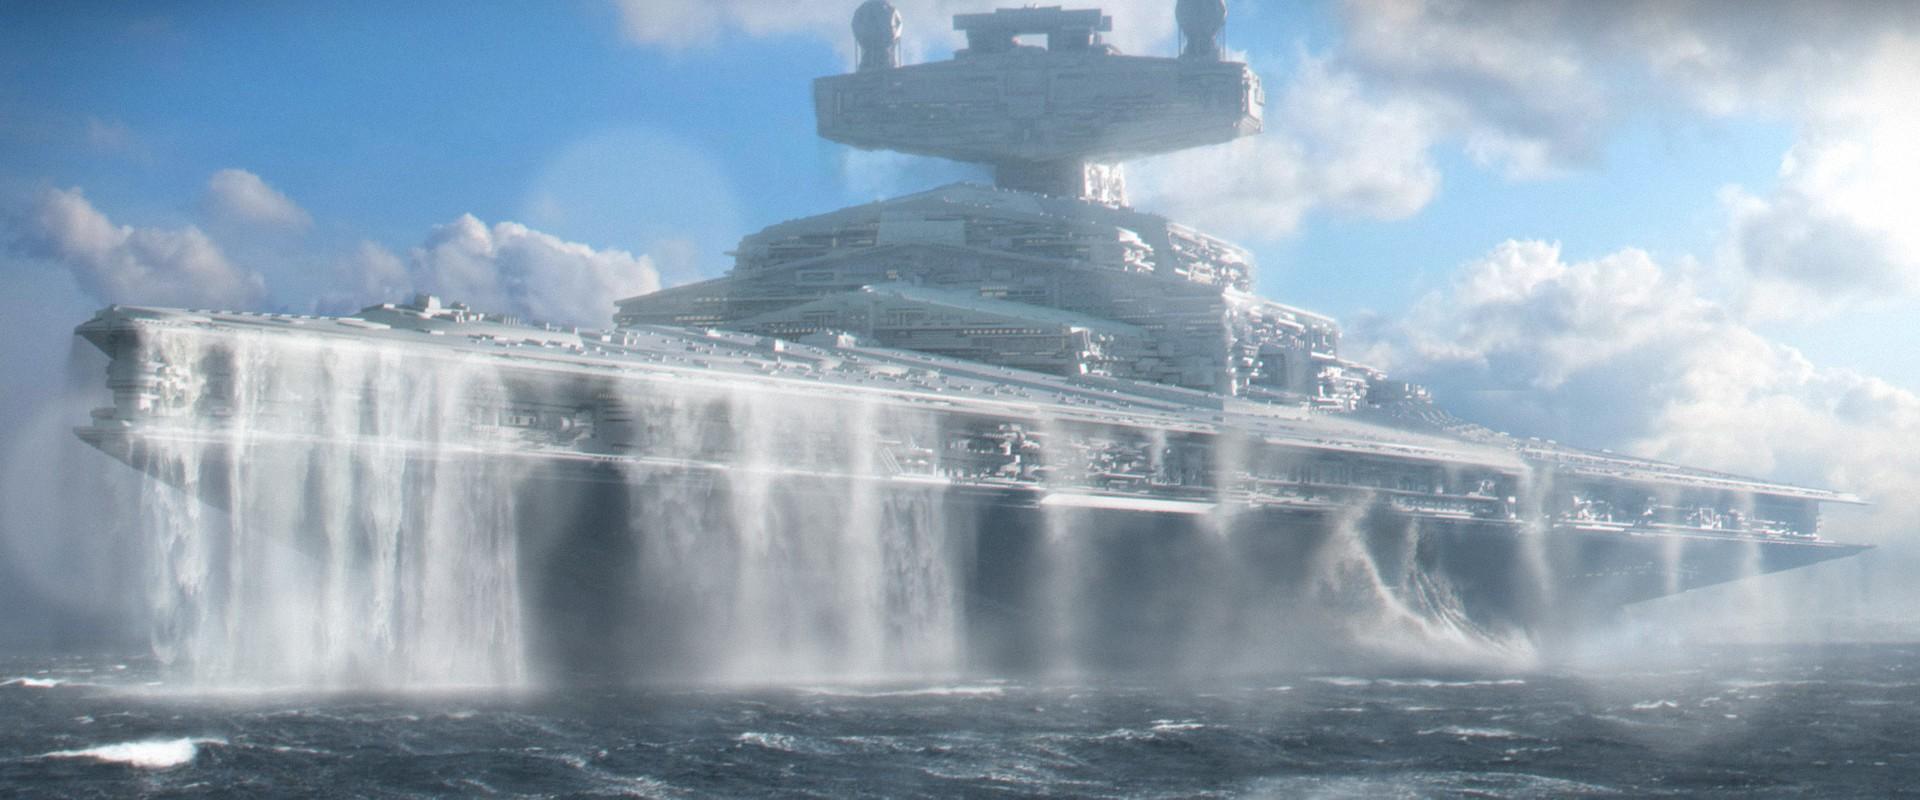 Wallpaper Star Wars Ice Star Destroyer Fountain Landmark Atmospheric Phenomenon Water Feature 1920x800 Ludendorf 22357 Hd Wallpapers Wallhere